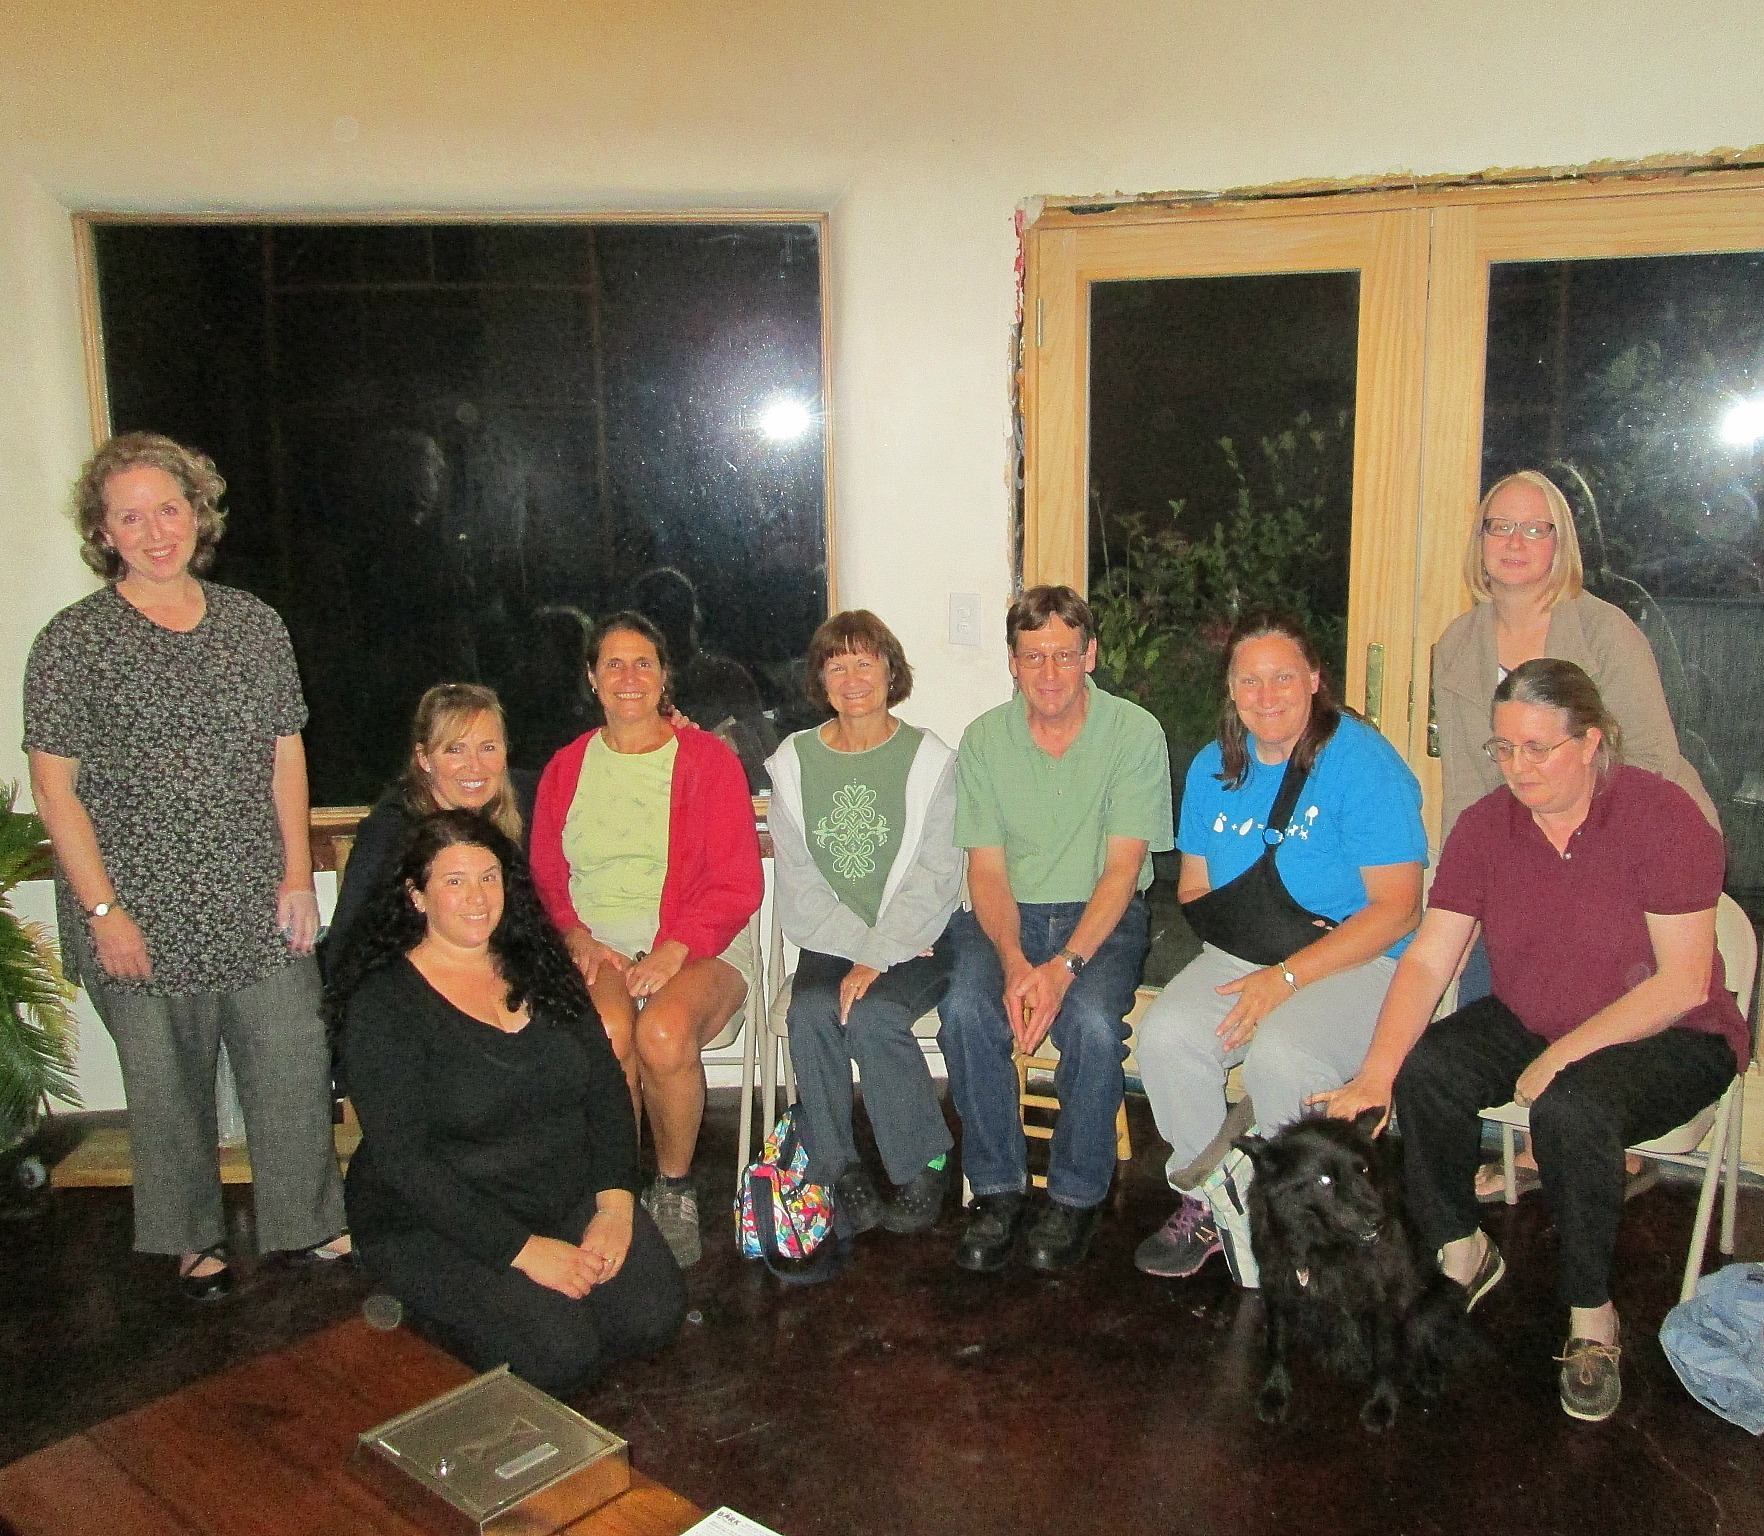 Our wonderful Dog Park committee members